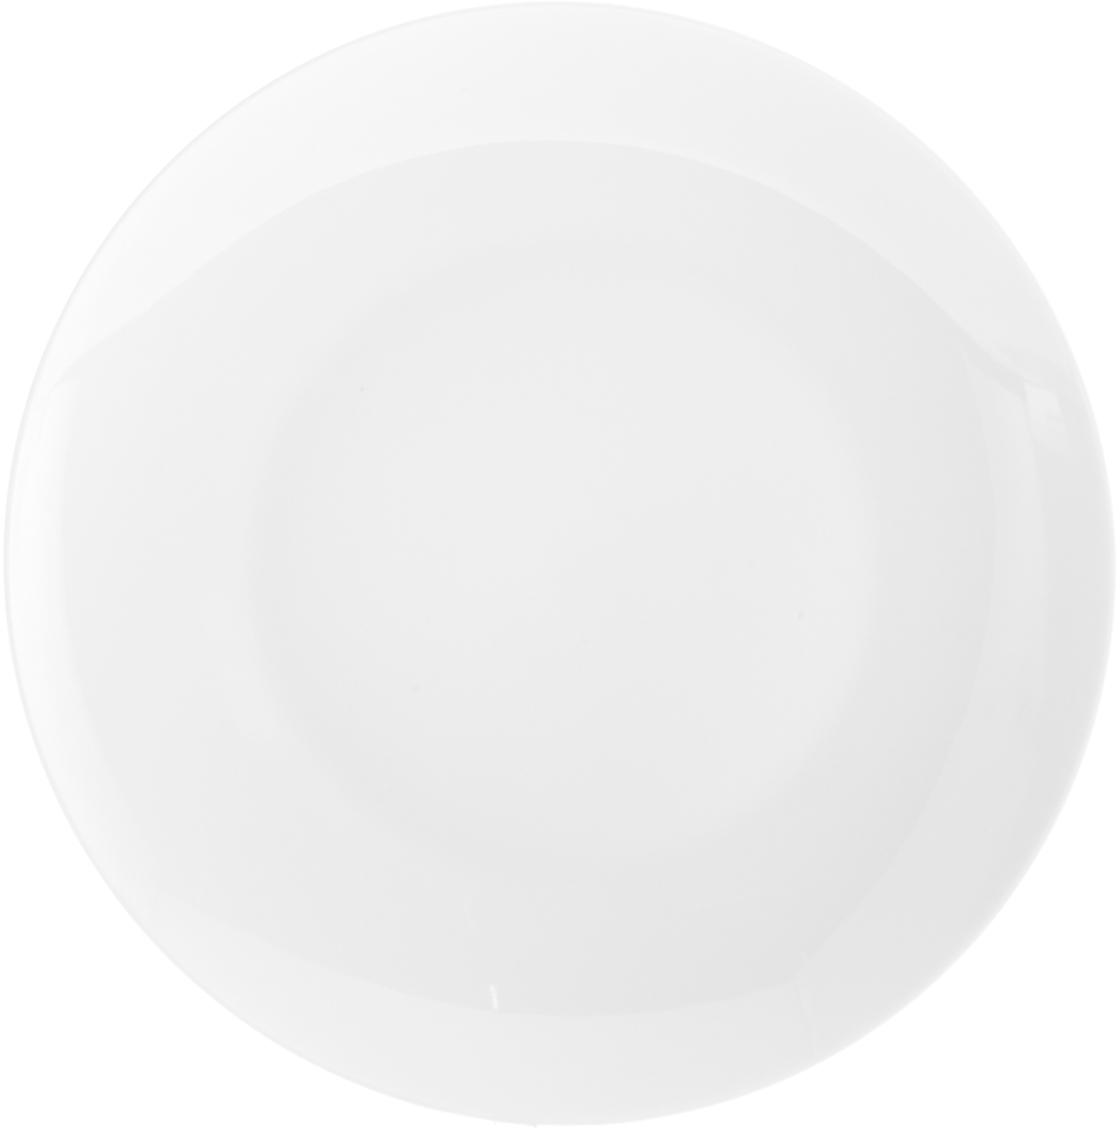 Platos llanos de porcelana Delight Modern, 2uds., Porcelana, Blanco, Ø 27 cm